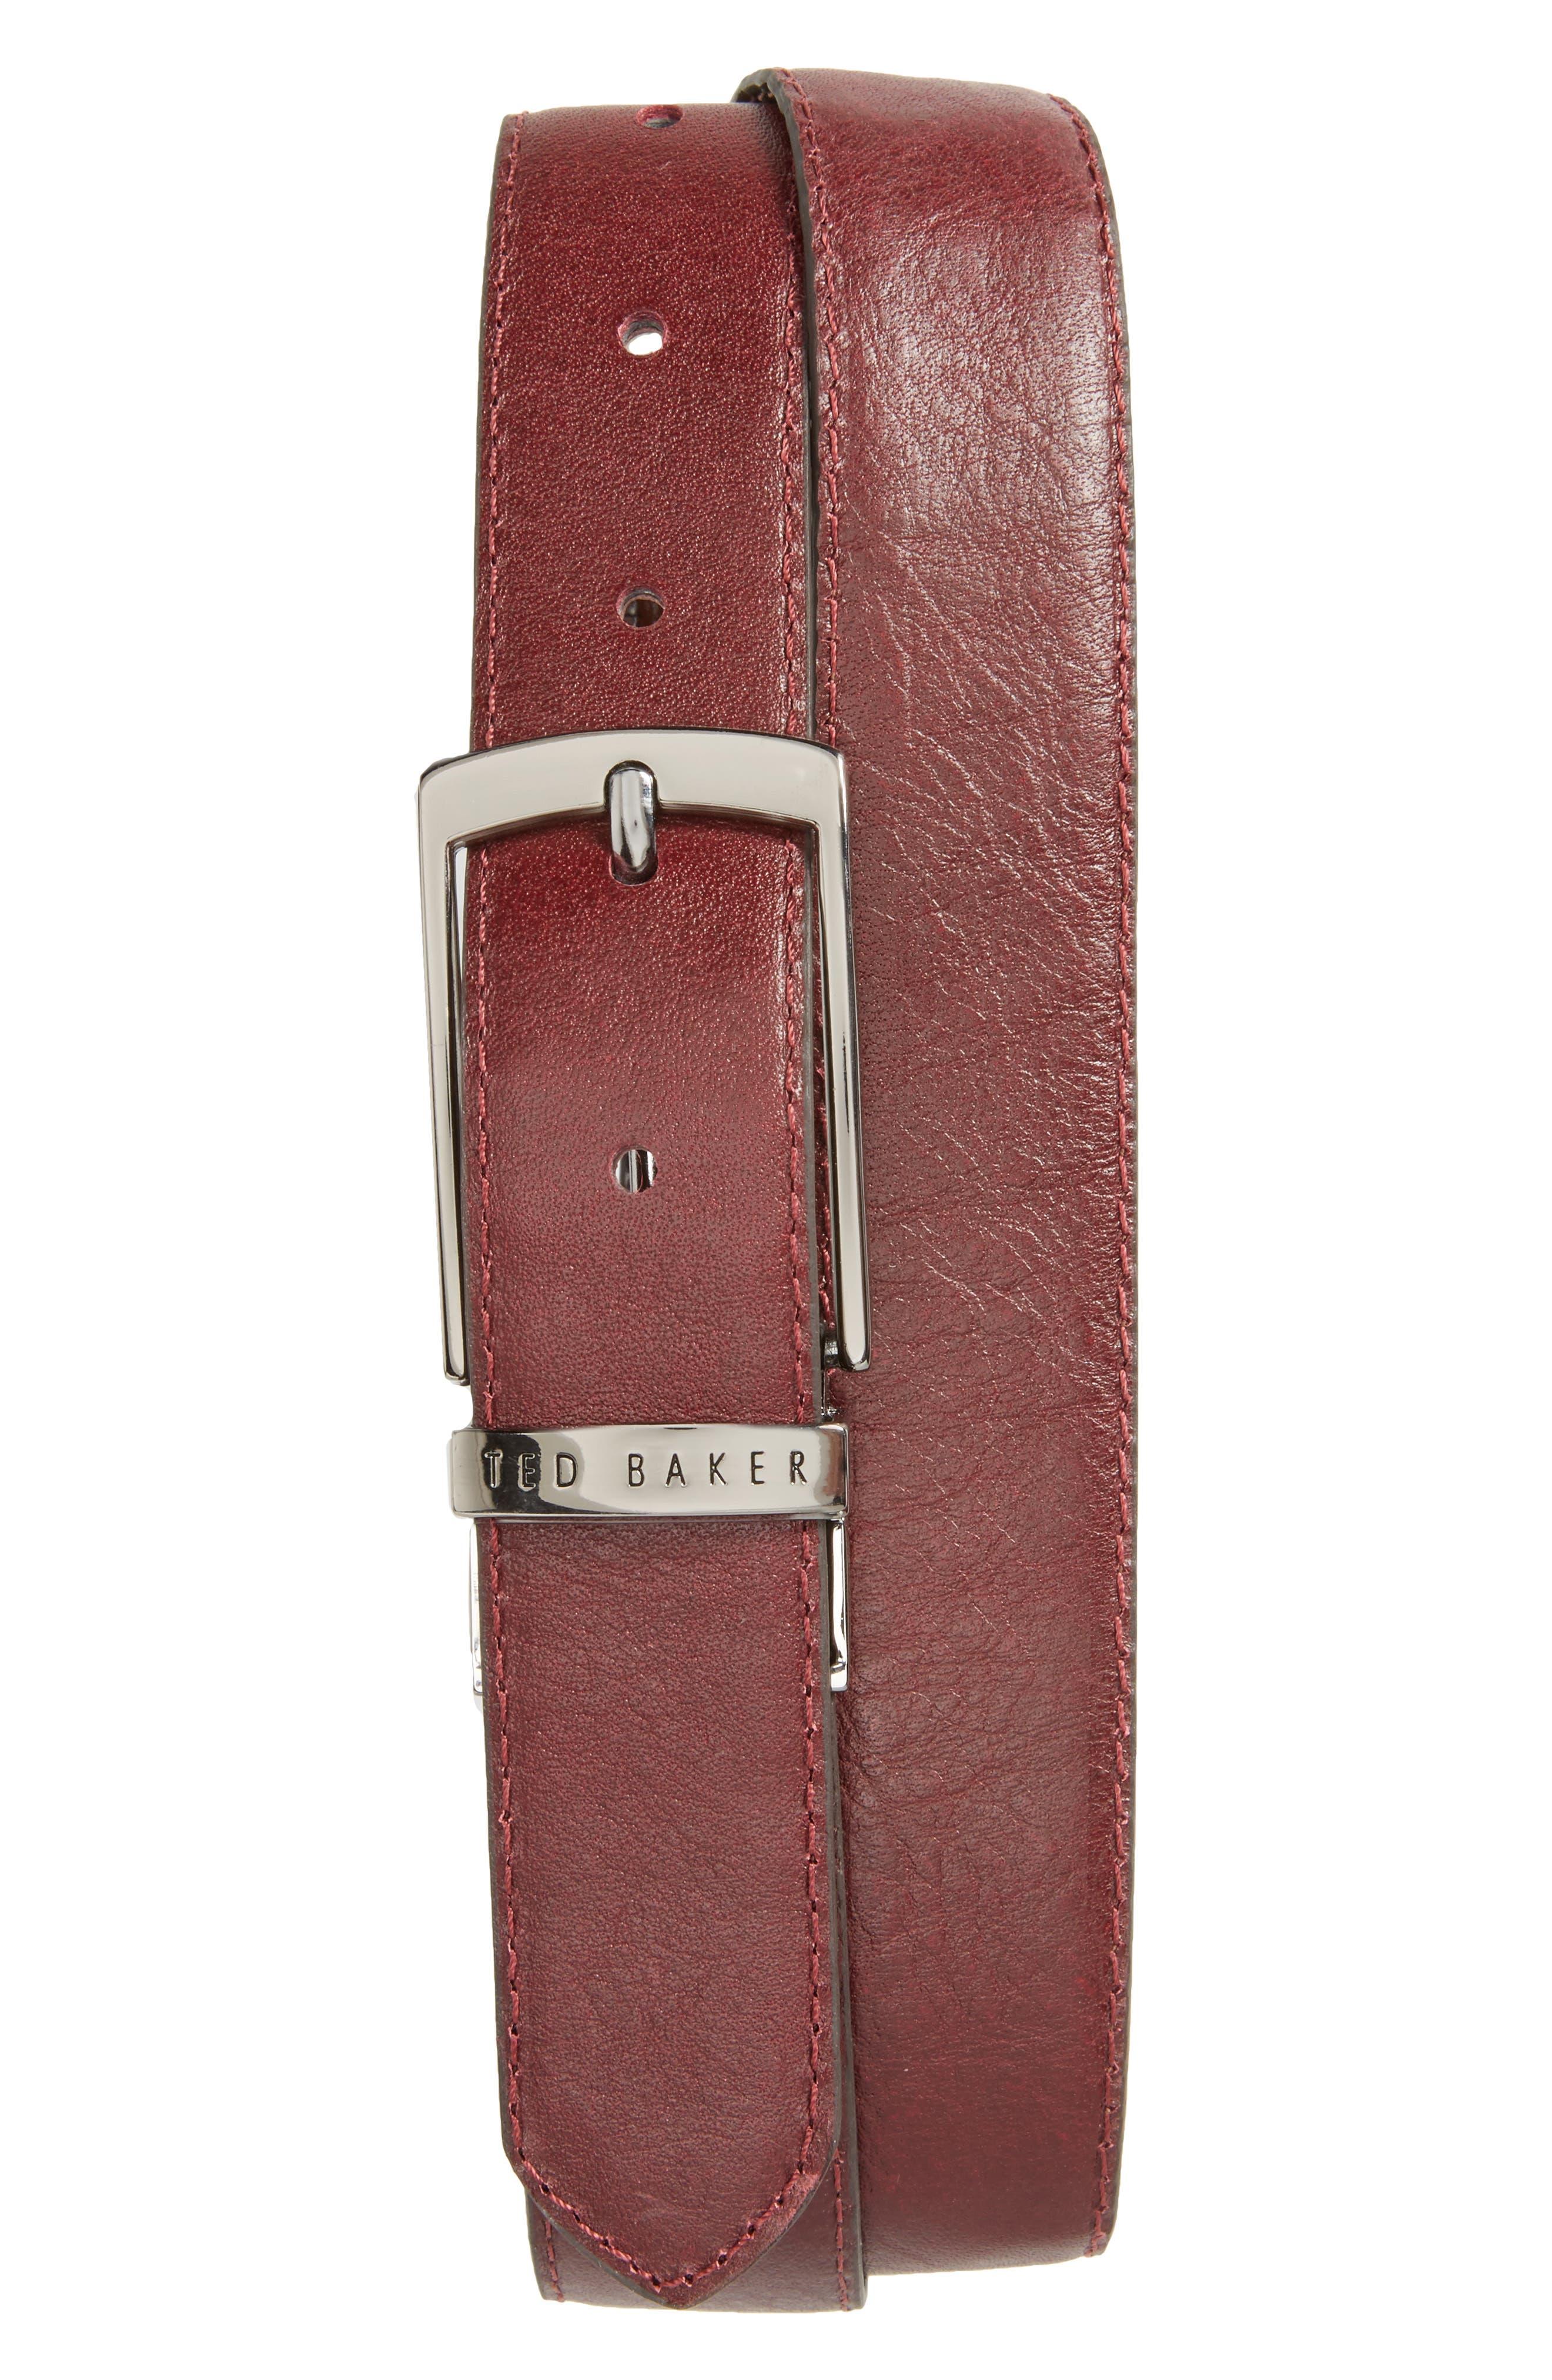 Sunflow Reversible Leather Belt,                             Alternate thumbnail 2, color,                             Chocolate/Burgundy